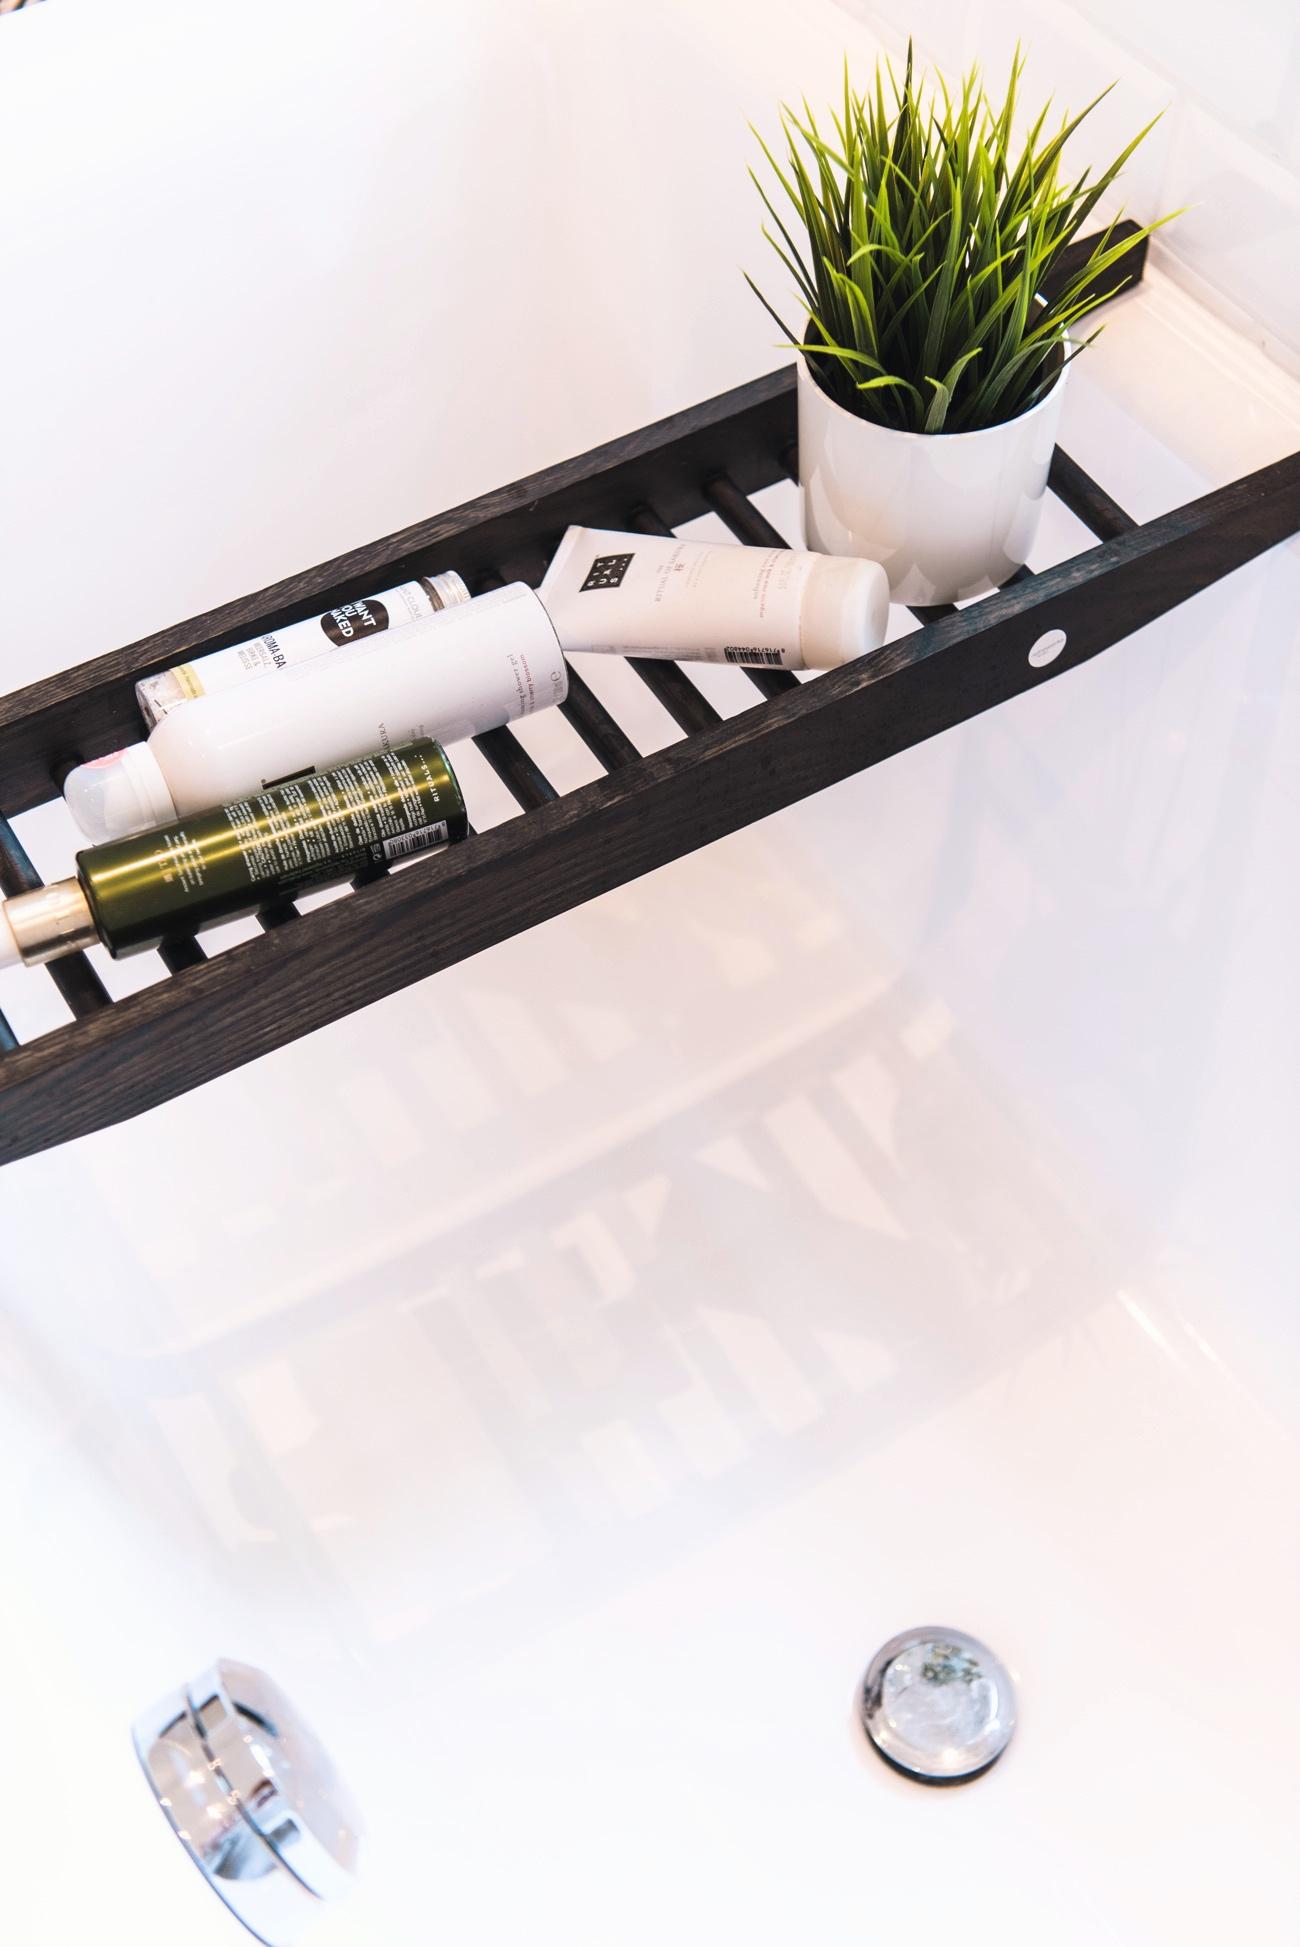 details-badezimmer-nina-fashiioncarpet-modeblog-münchen-deutschland-fashionblog-germany-interiorblogger-fashiioncarpet